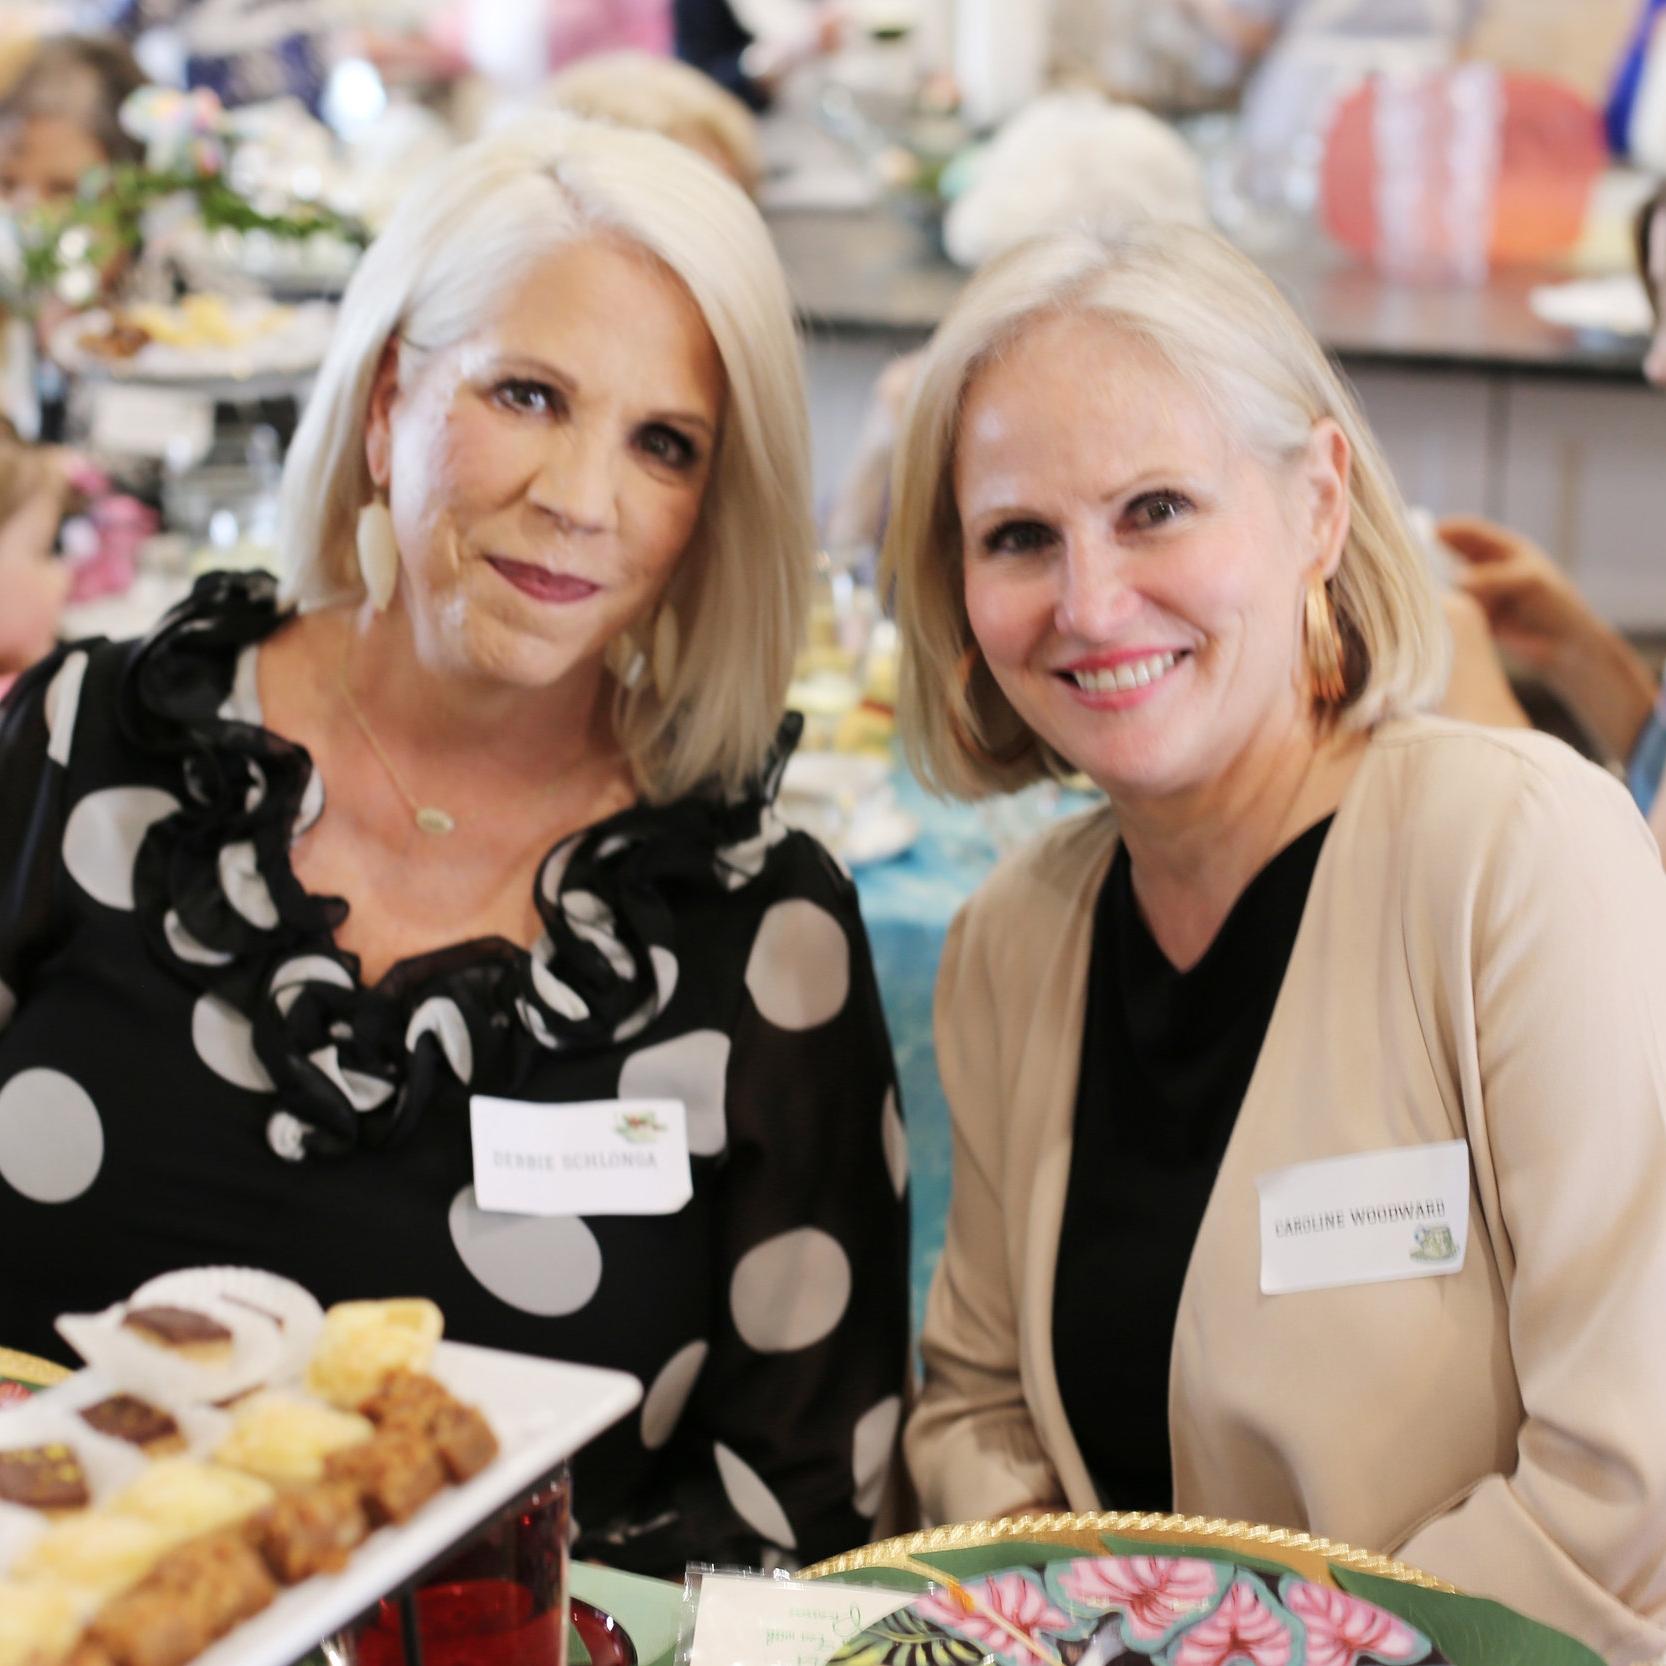 Debbie Schlonga and Caroline Woodward